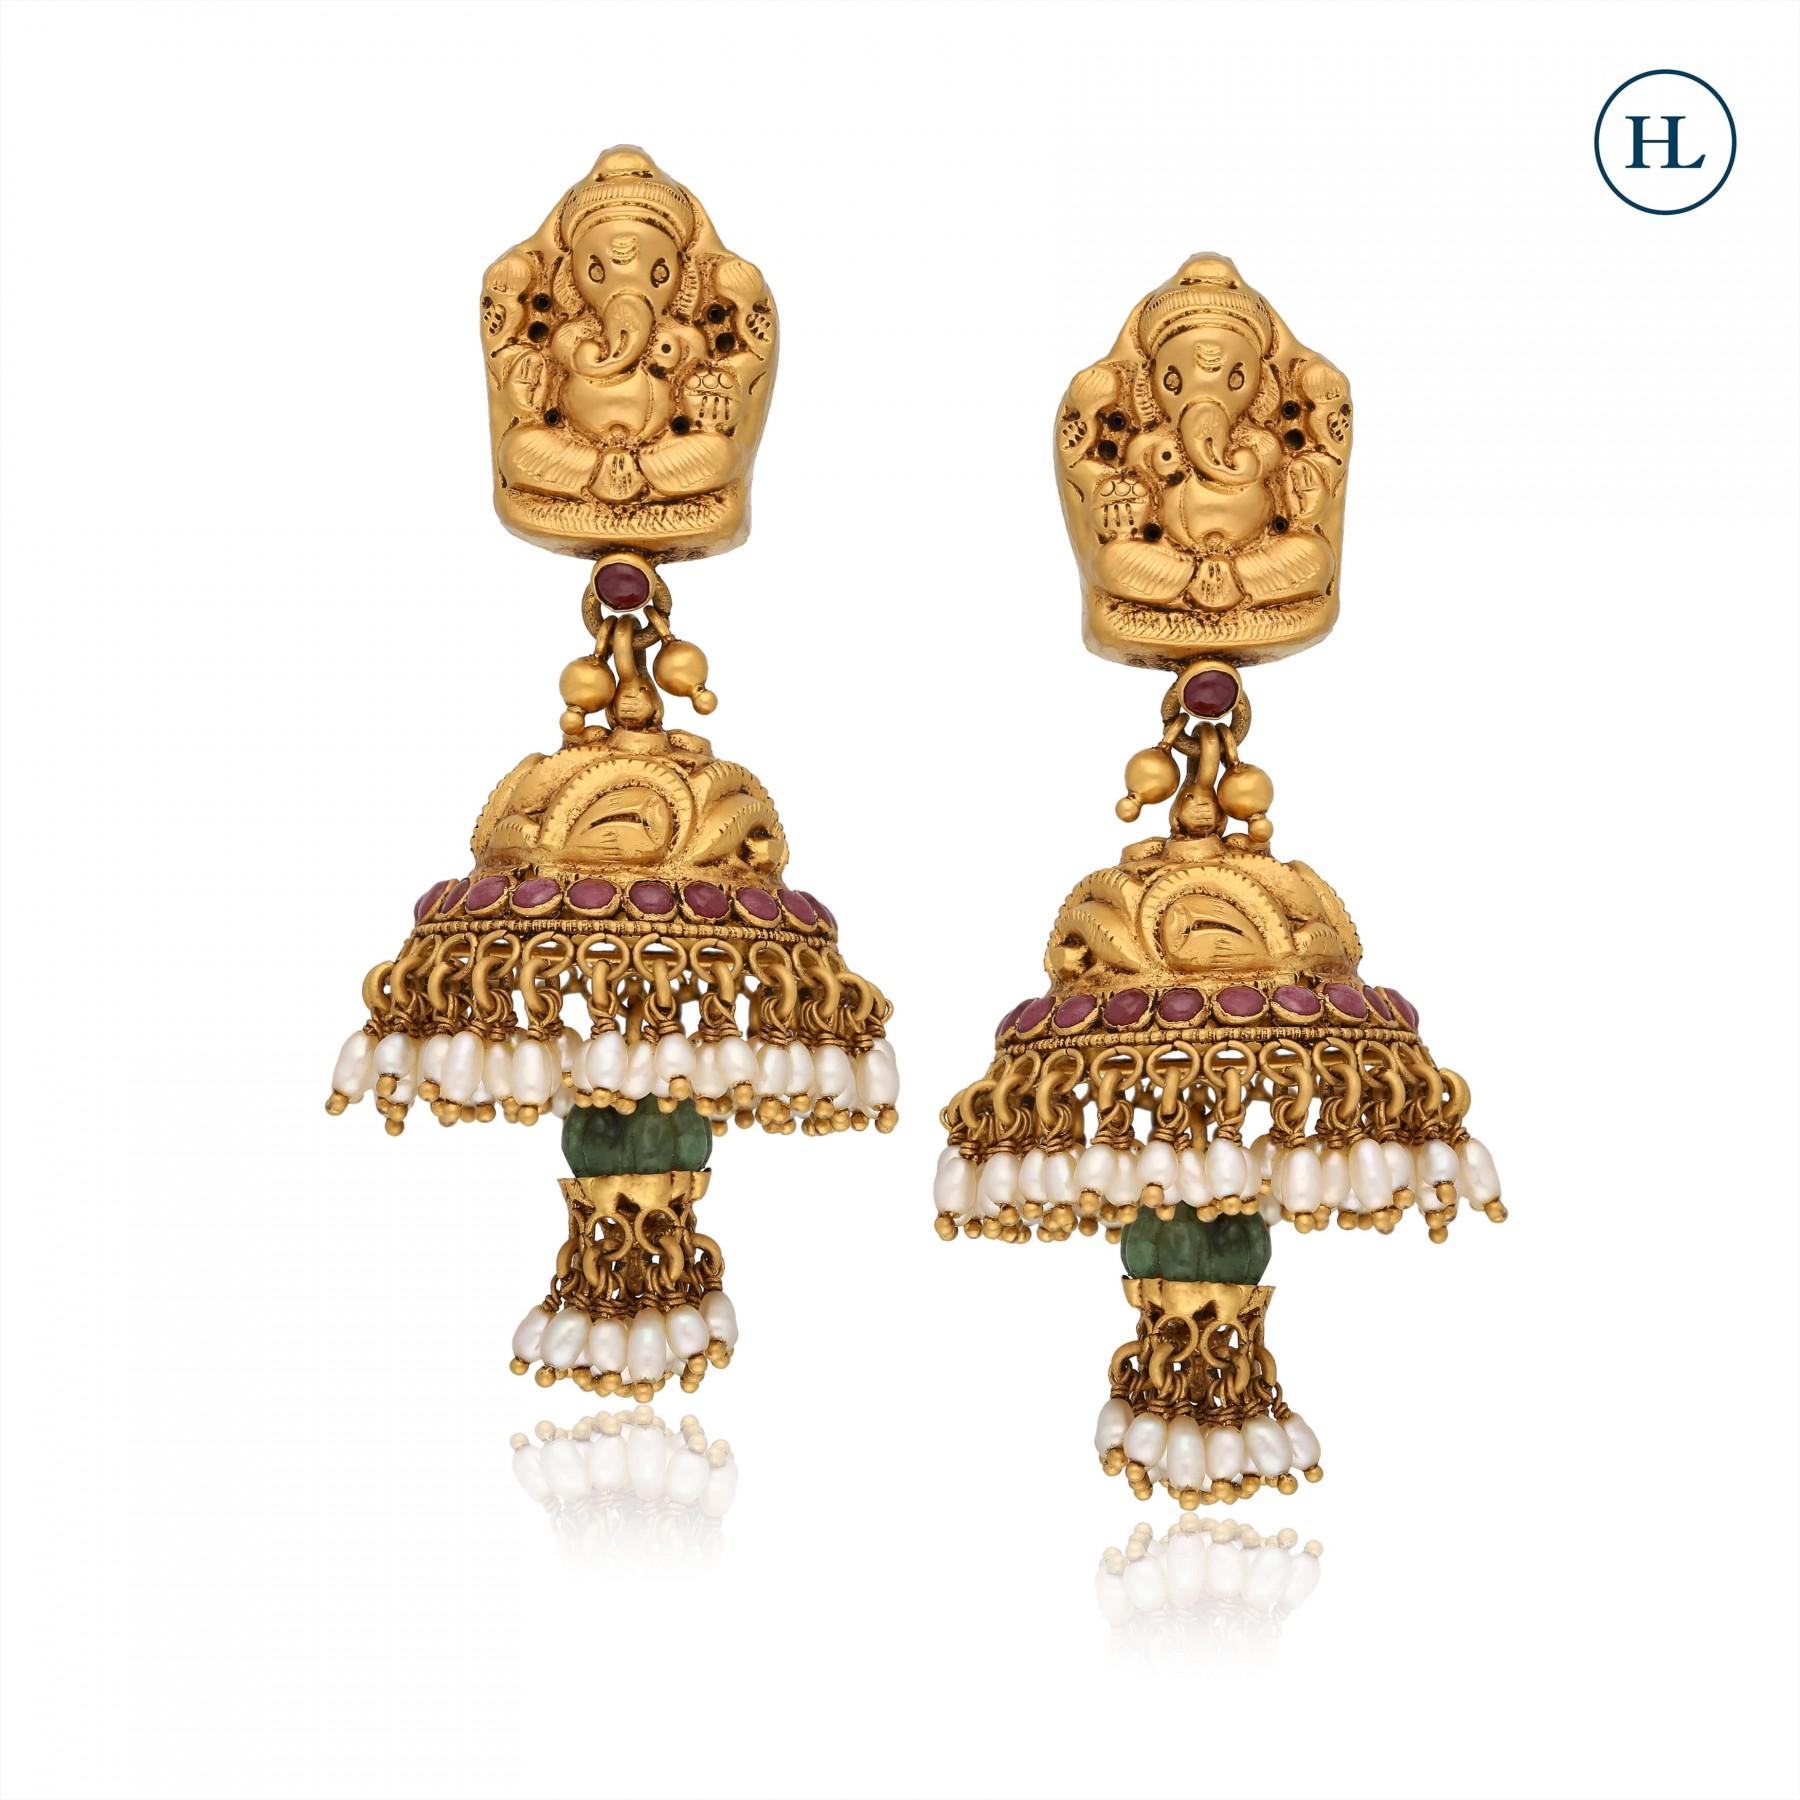 Emerald & Gold Temple Earrings